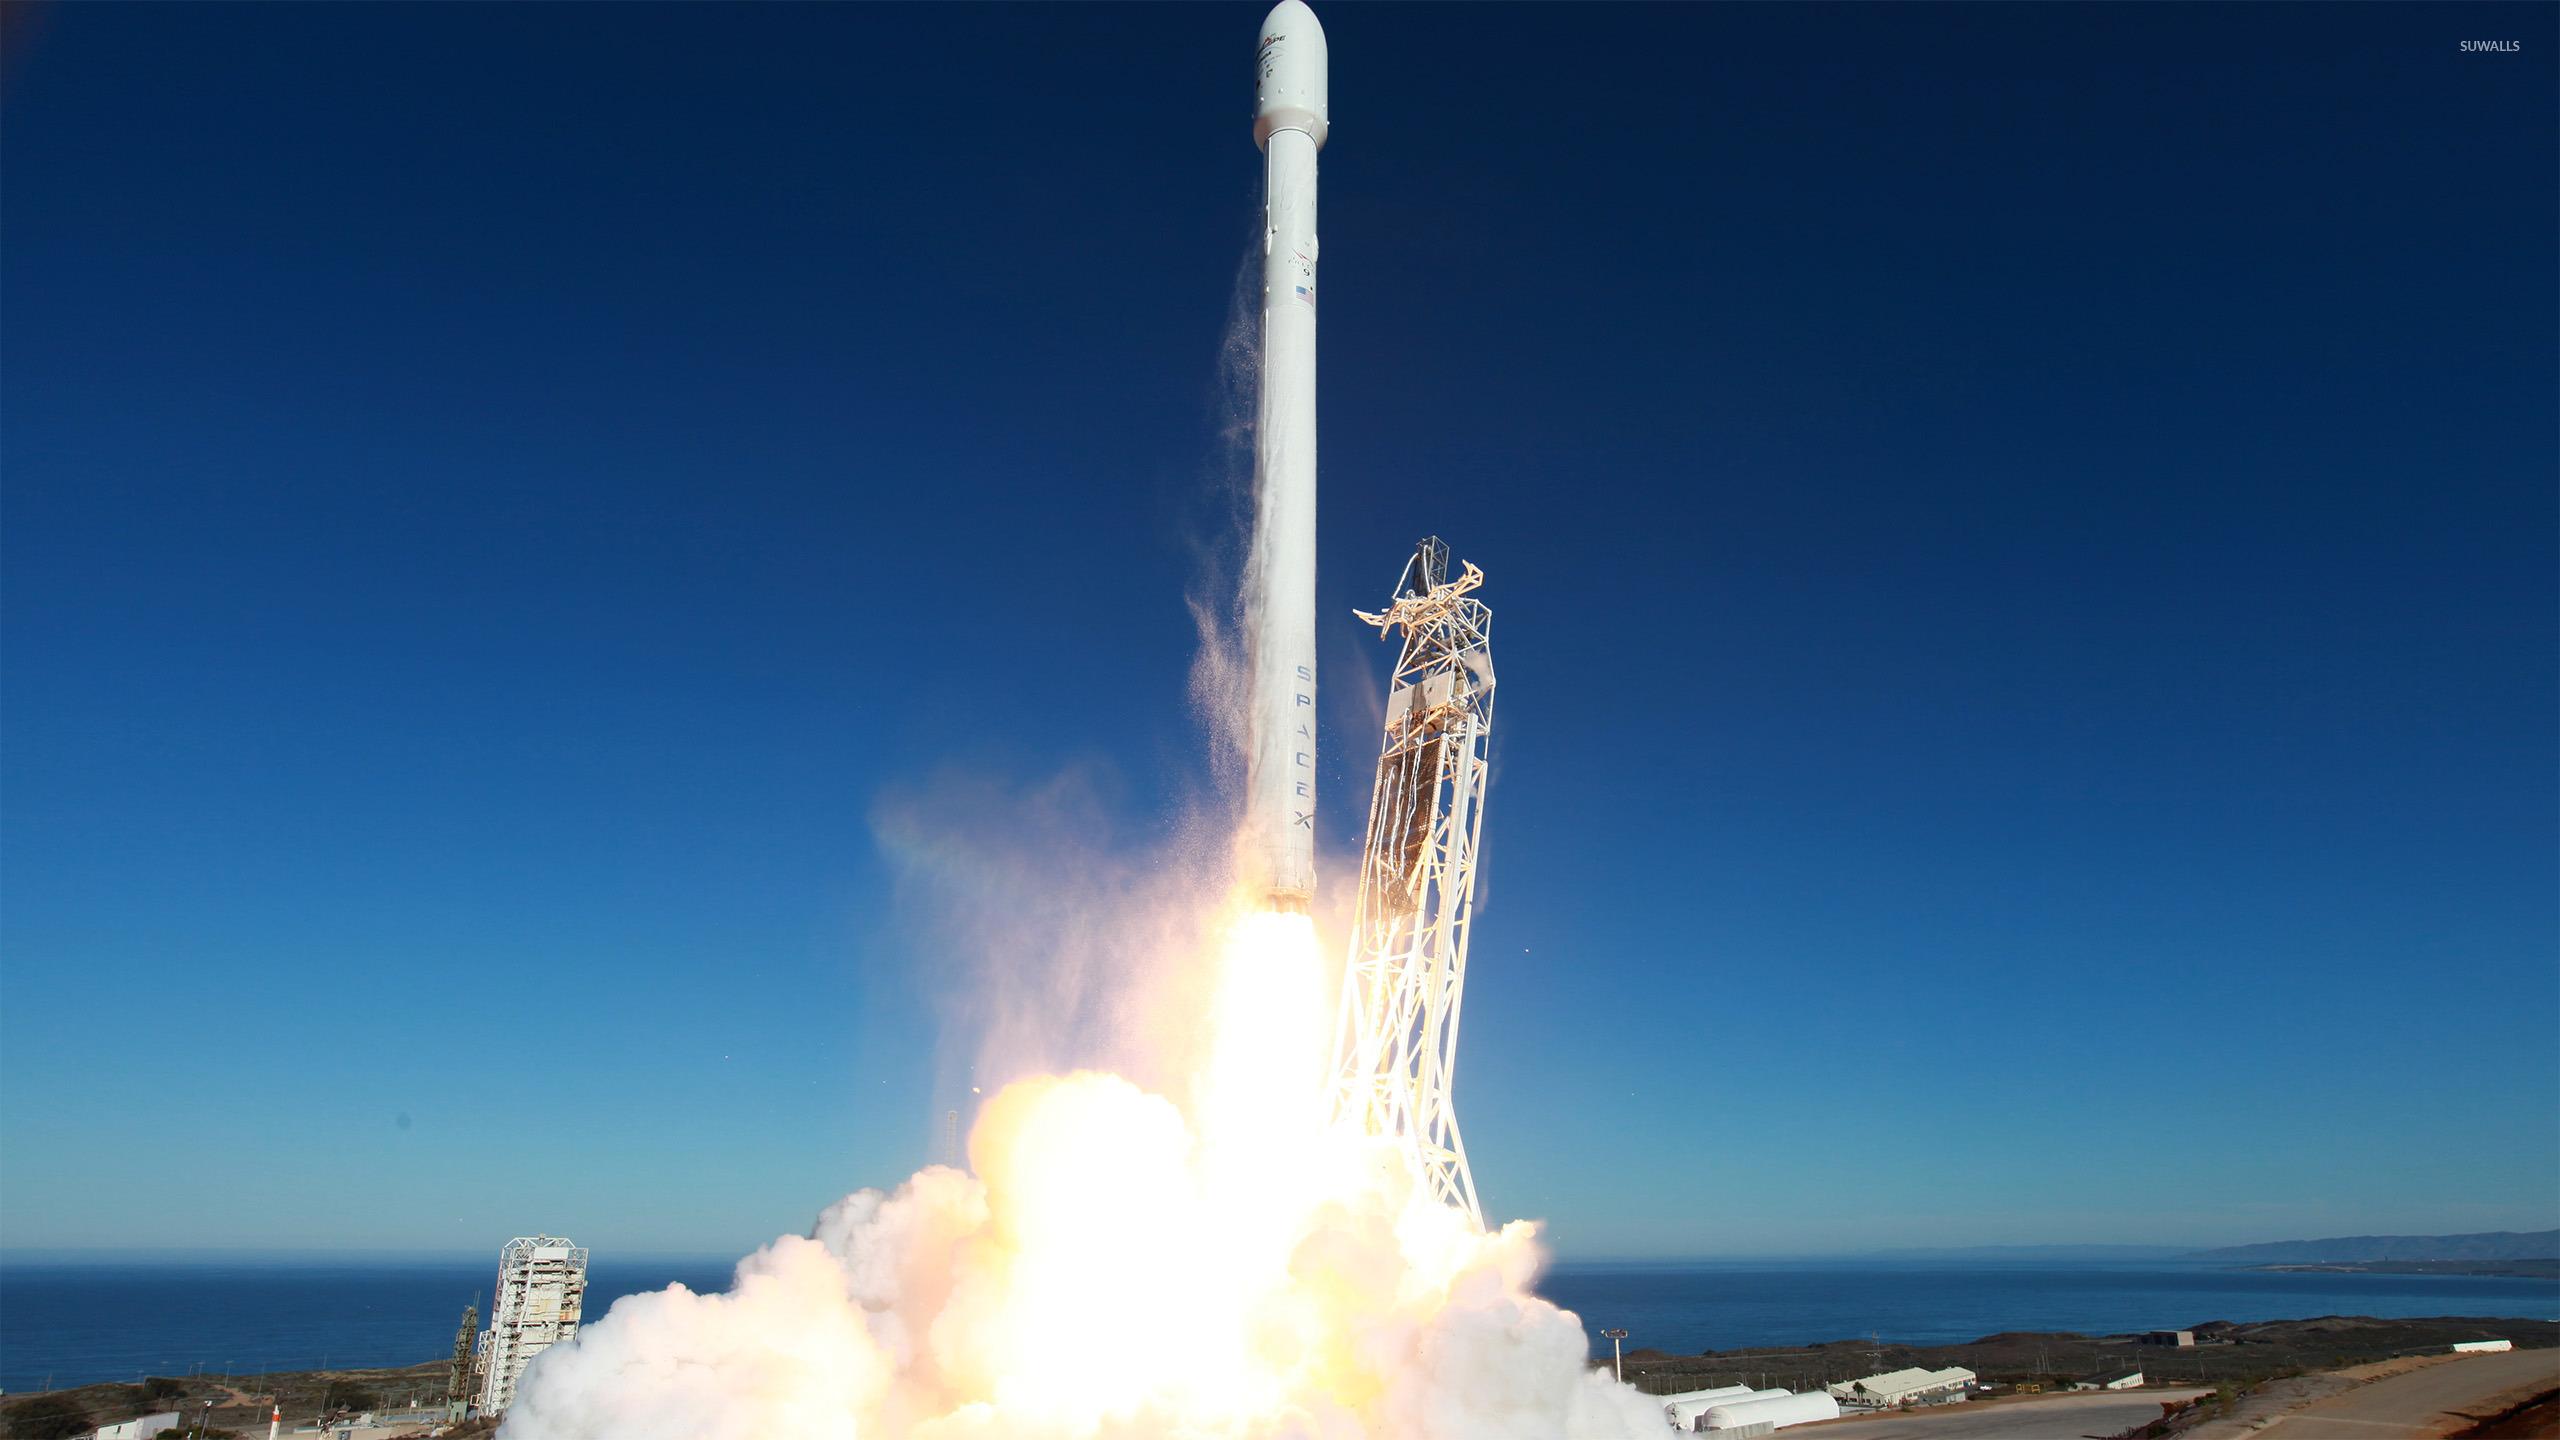 Rocket launching wallpaper - Space wallpapers - #37164